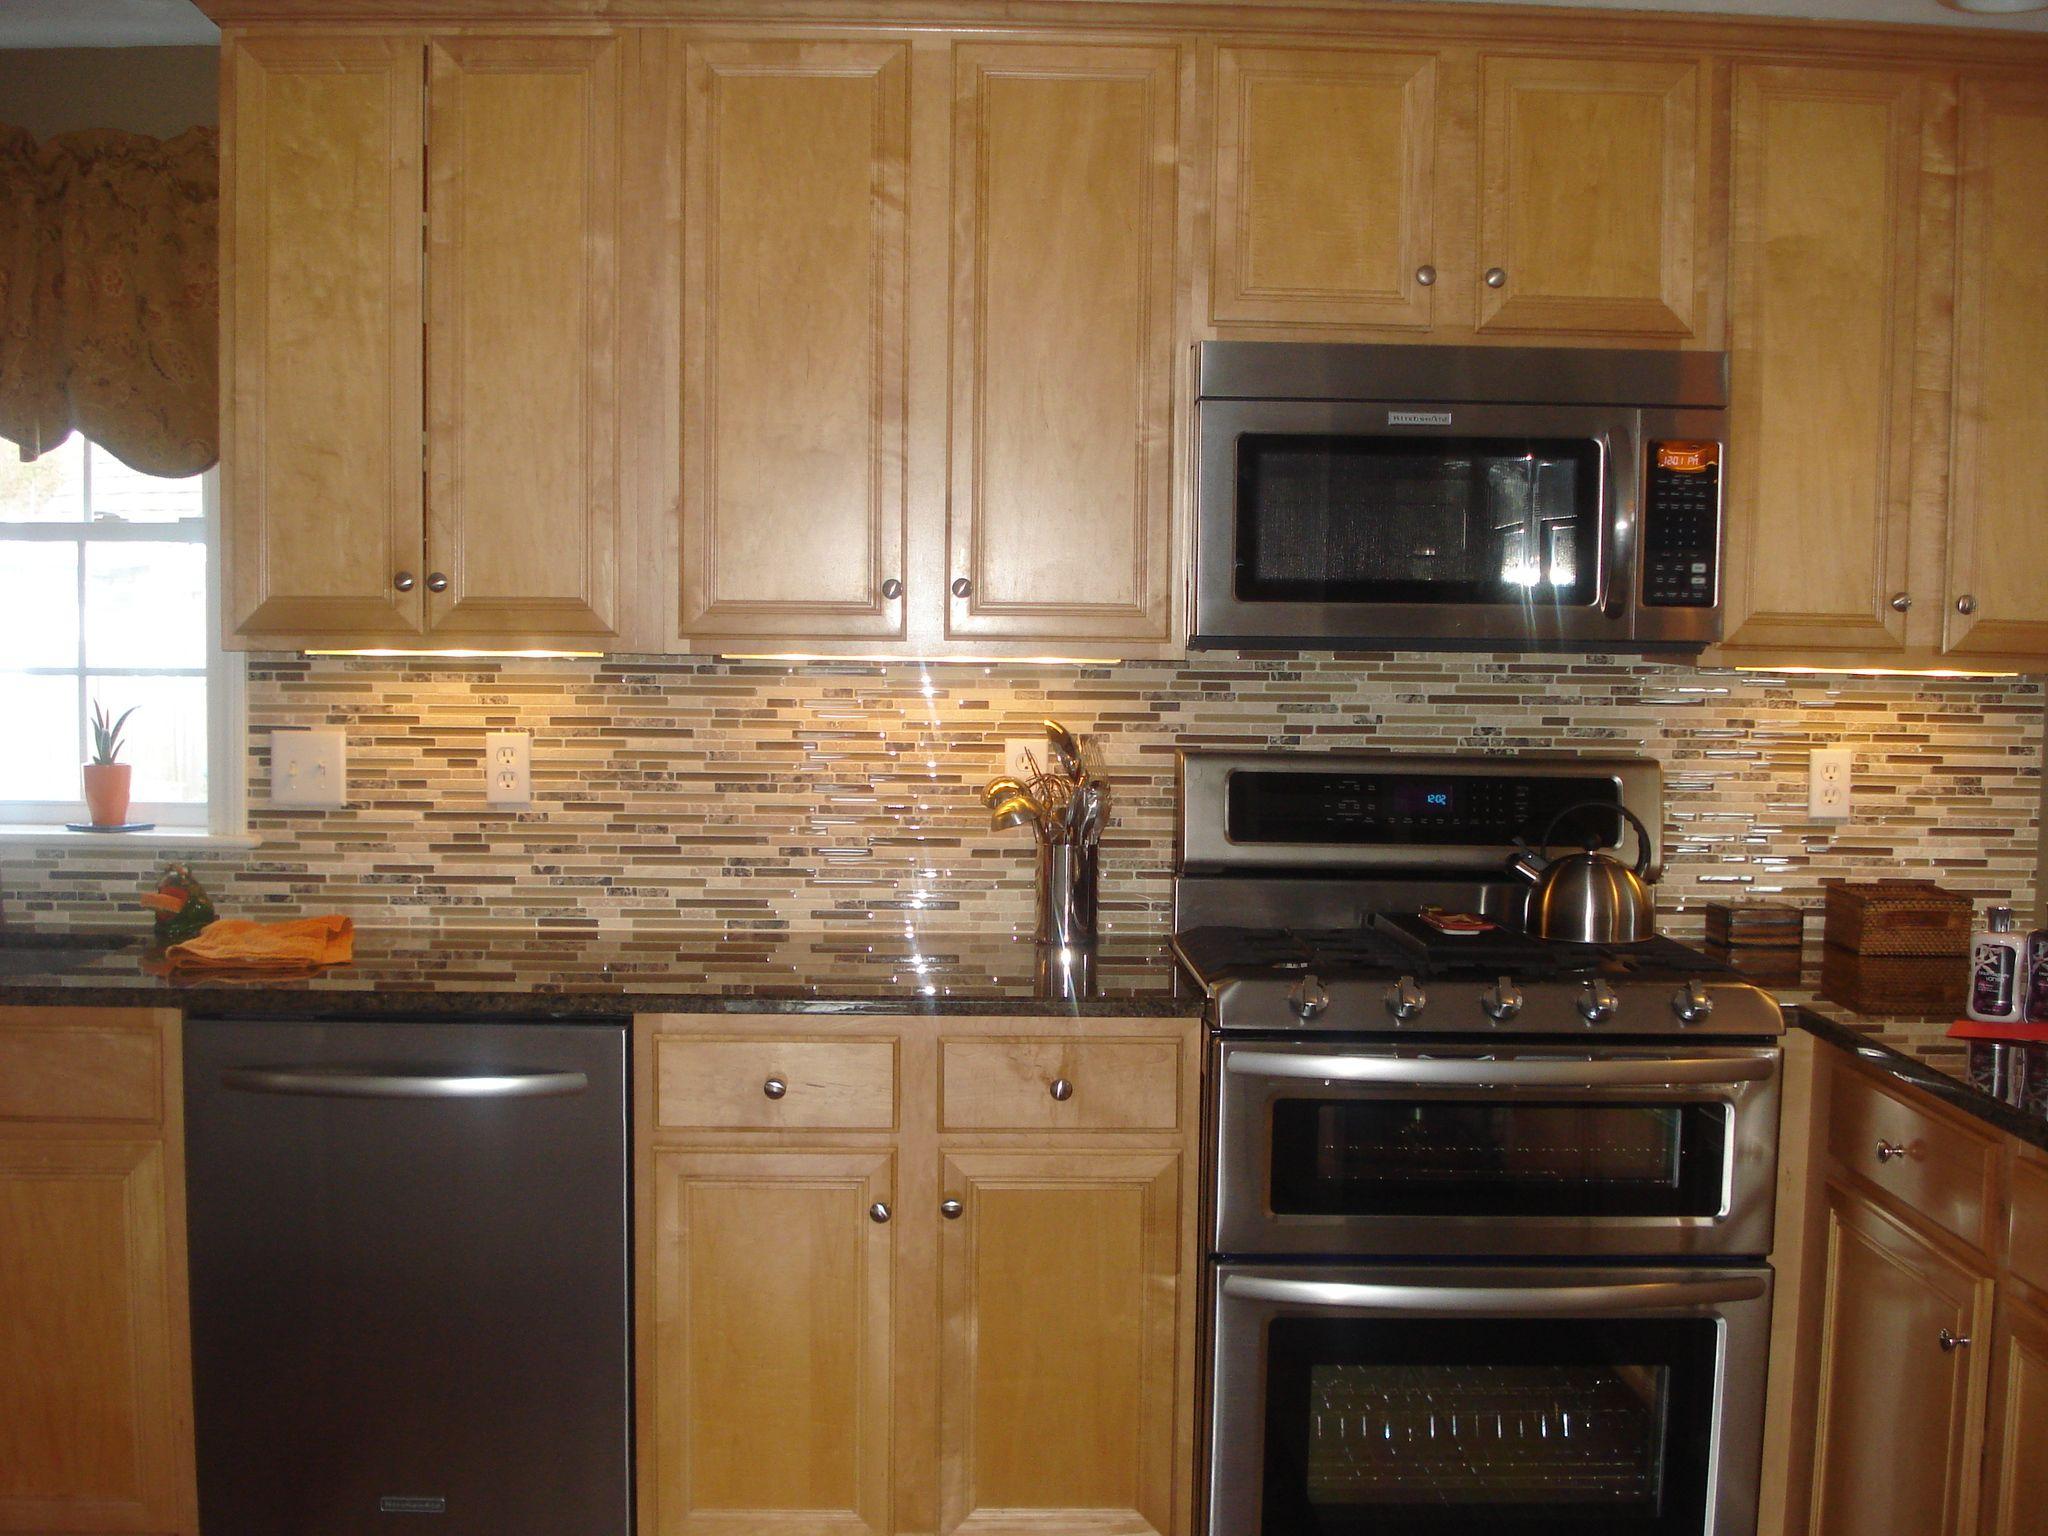 10 Stylish Backsplash Ideas With Black Granite Countertops kitchen backsplash ideas black granite countertops backsplash ideas 2020